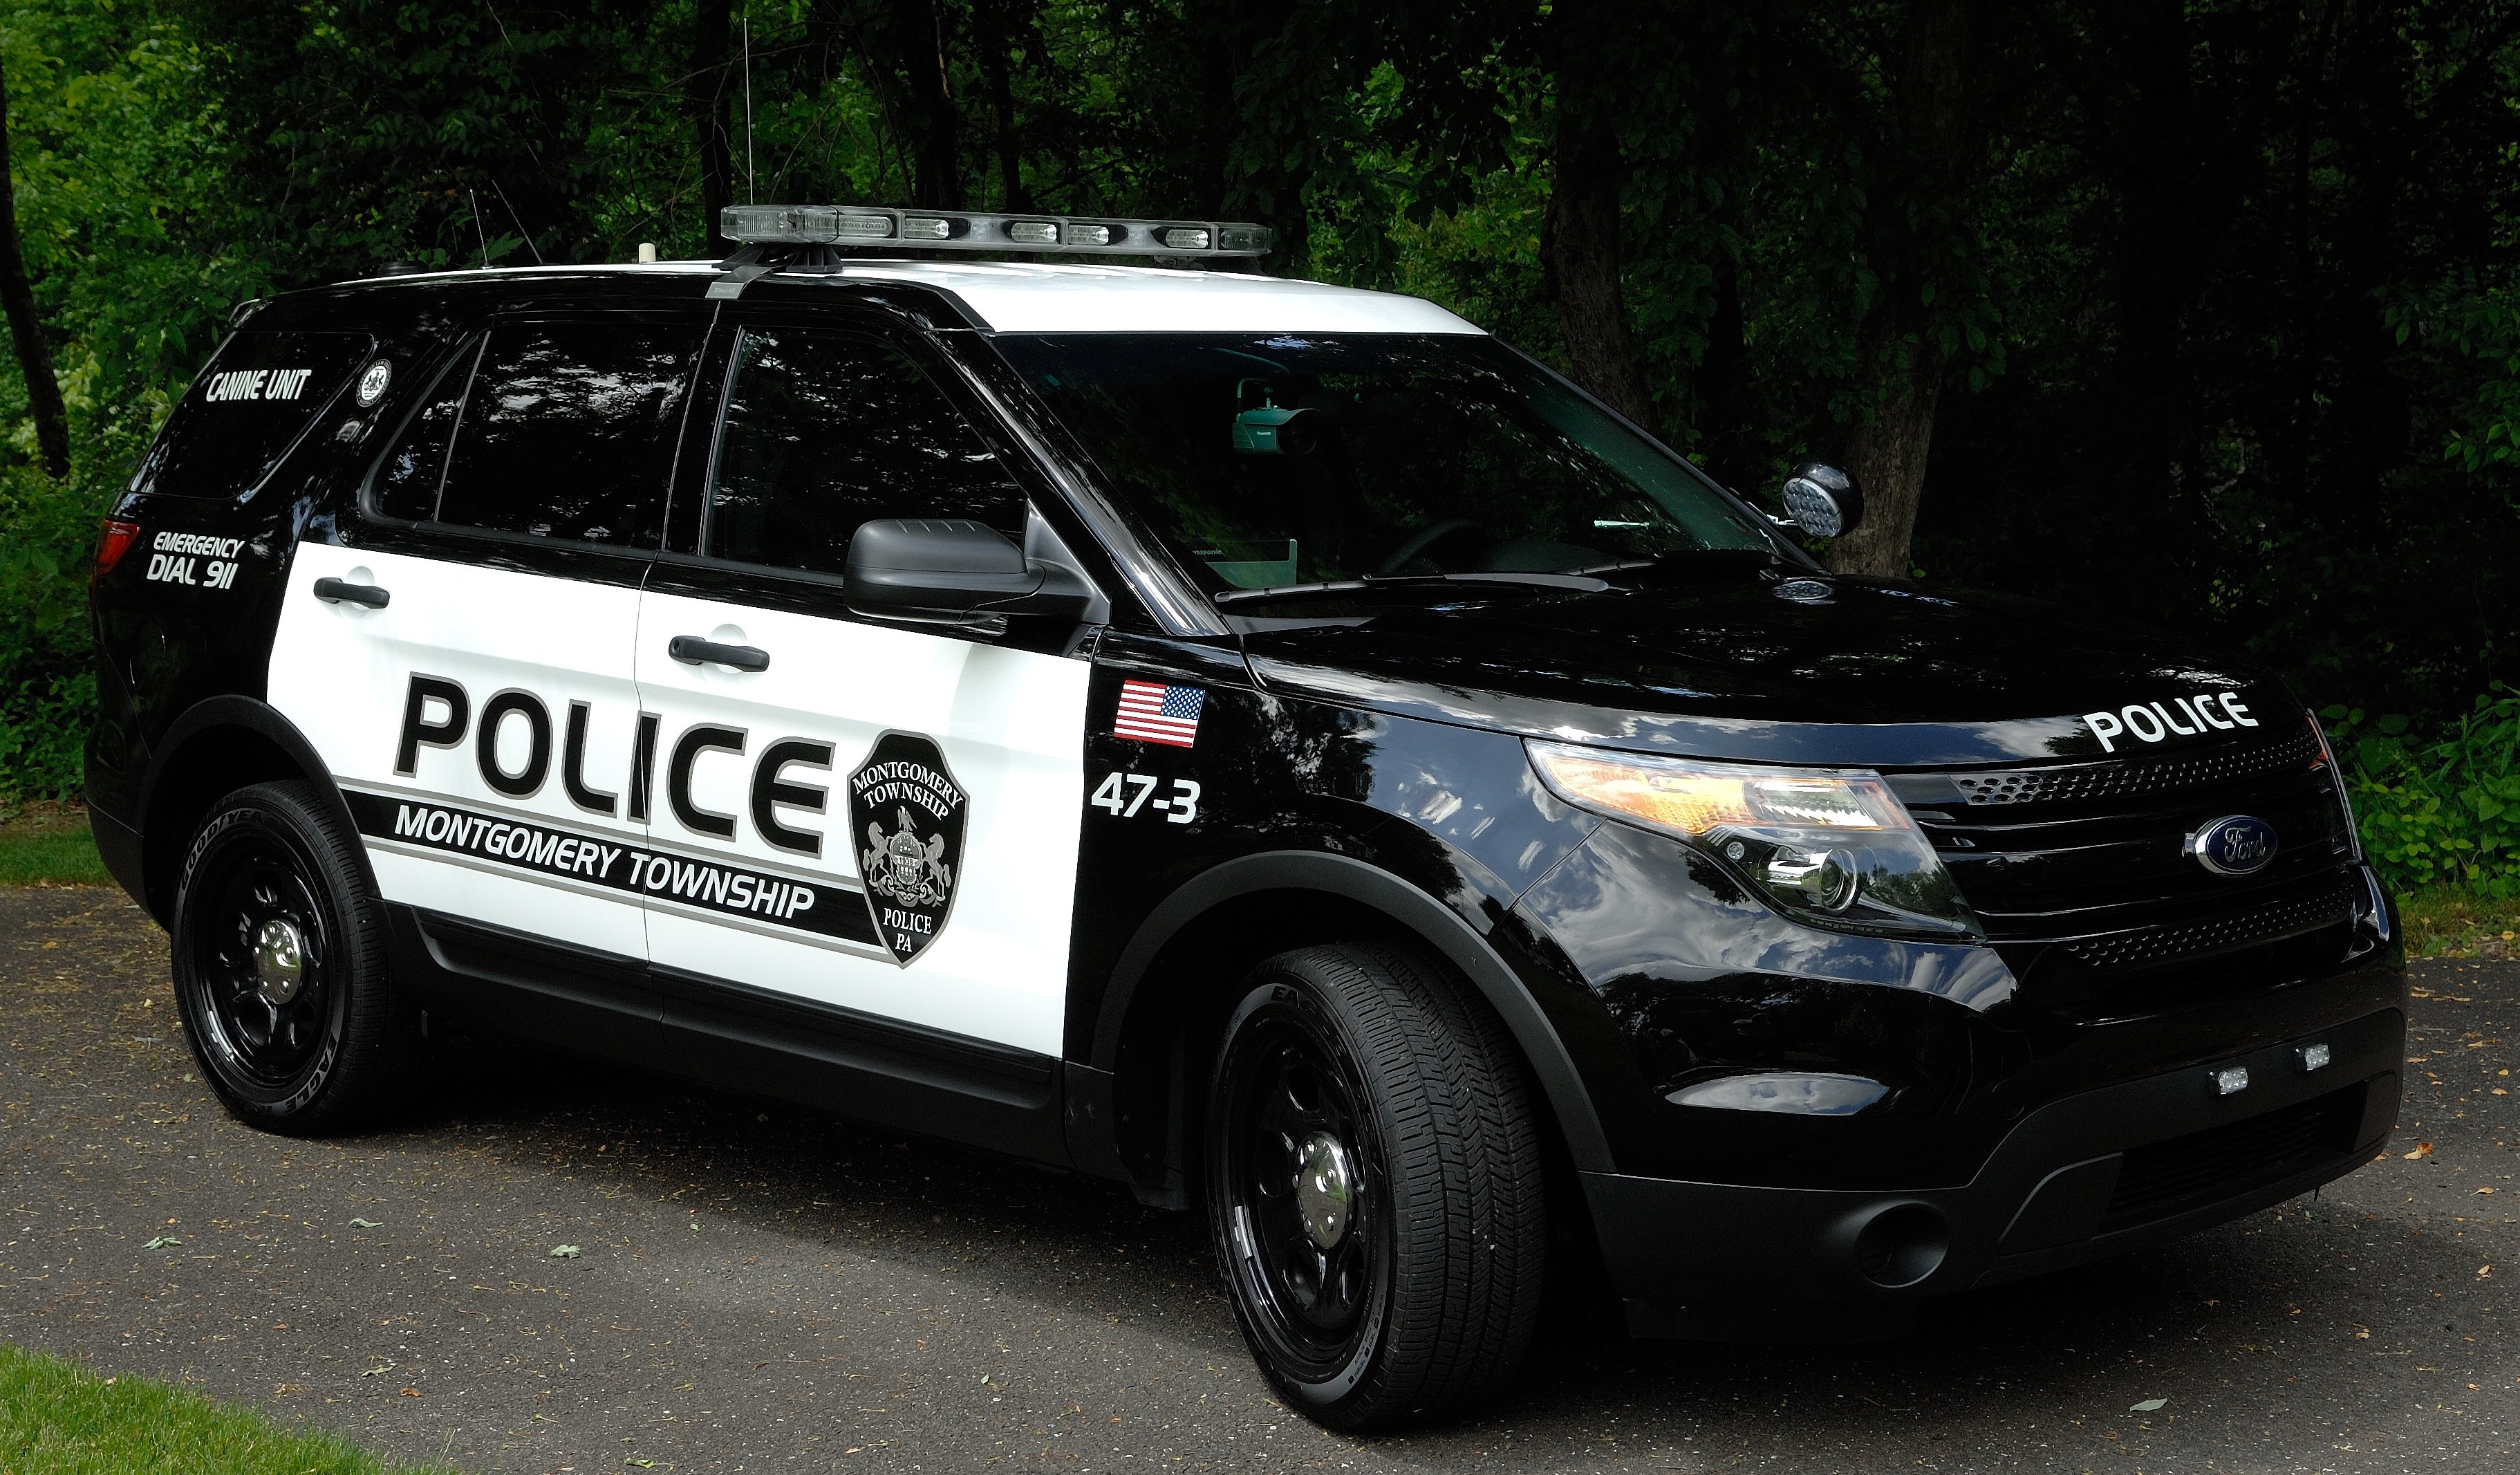 Montgomery Township Pennsylvania Police Department